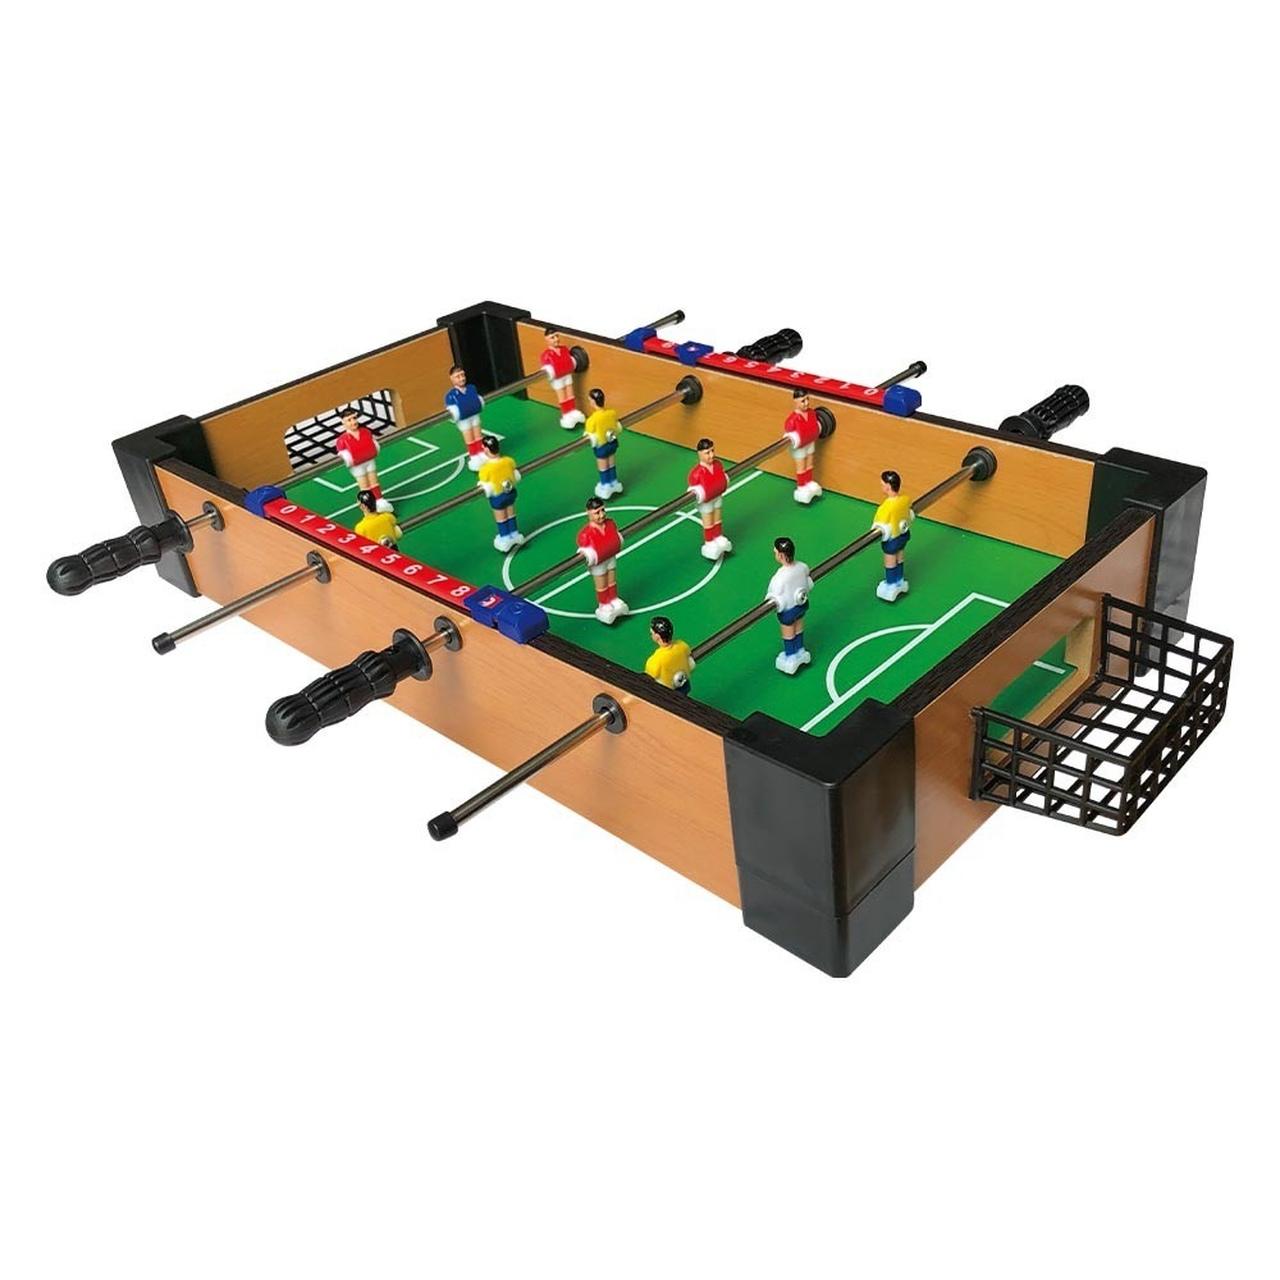 Pebolim Jogo De Futebol De Mesa Mini - Dmtoys